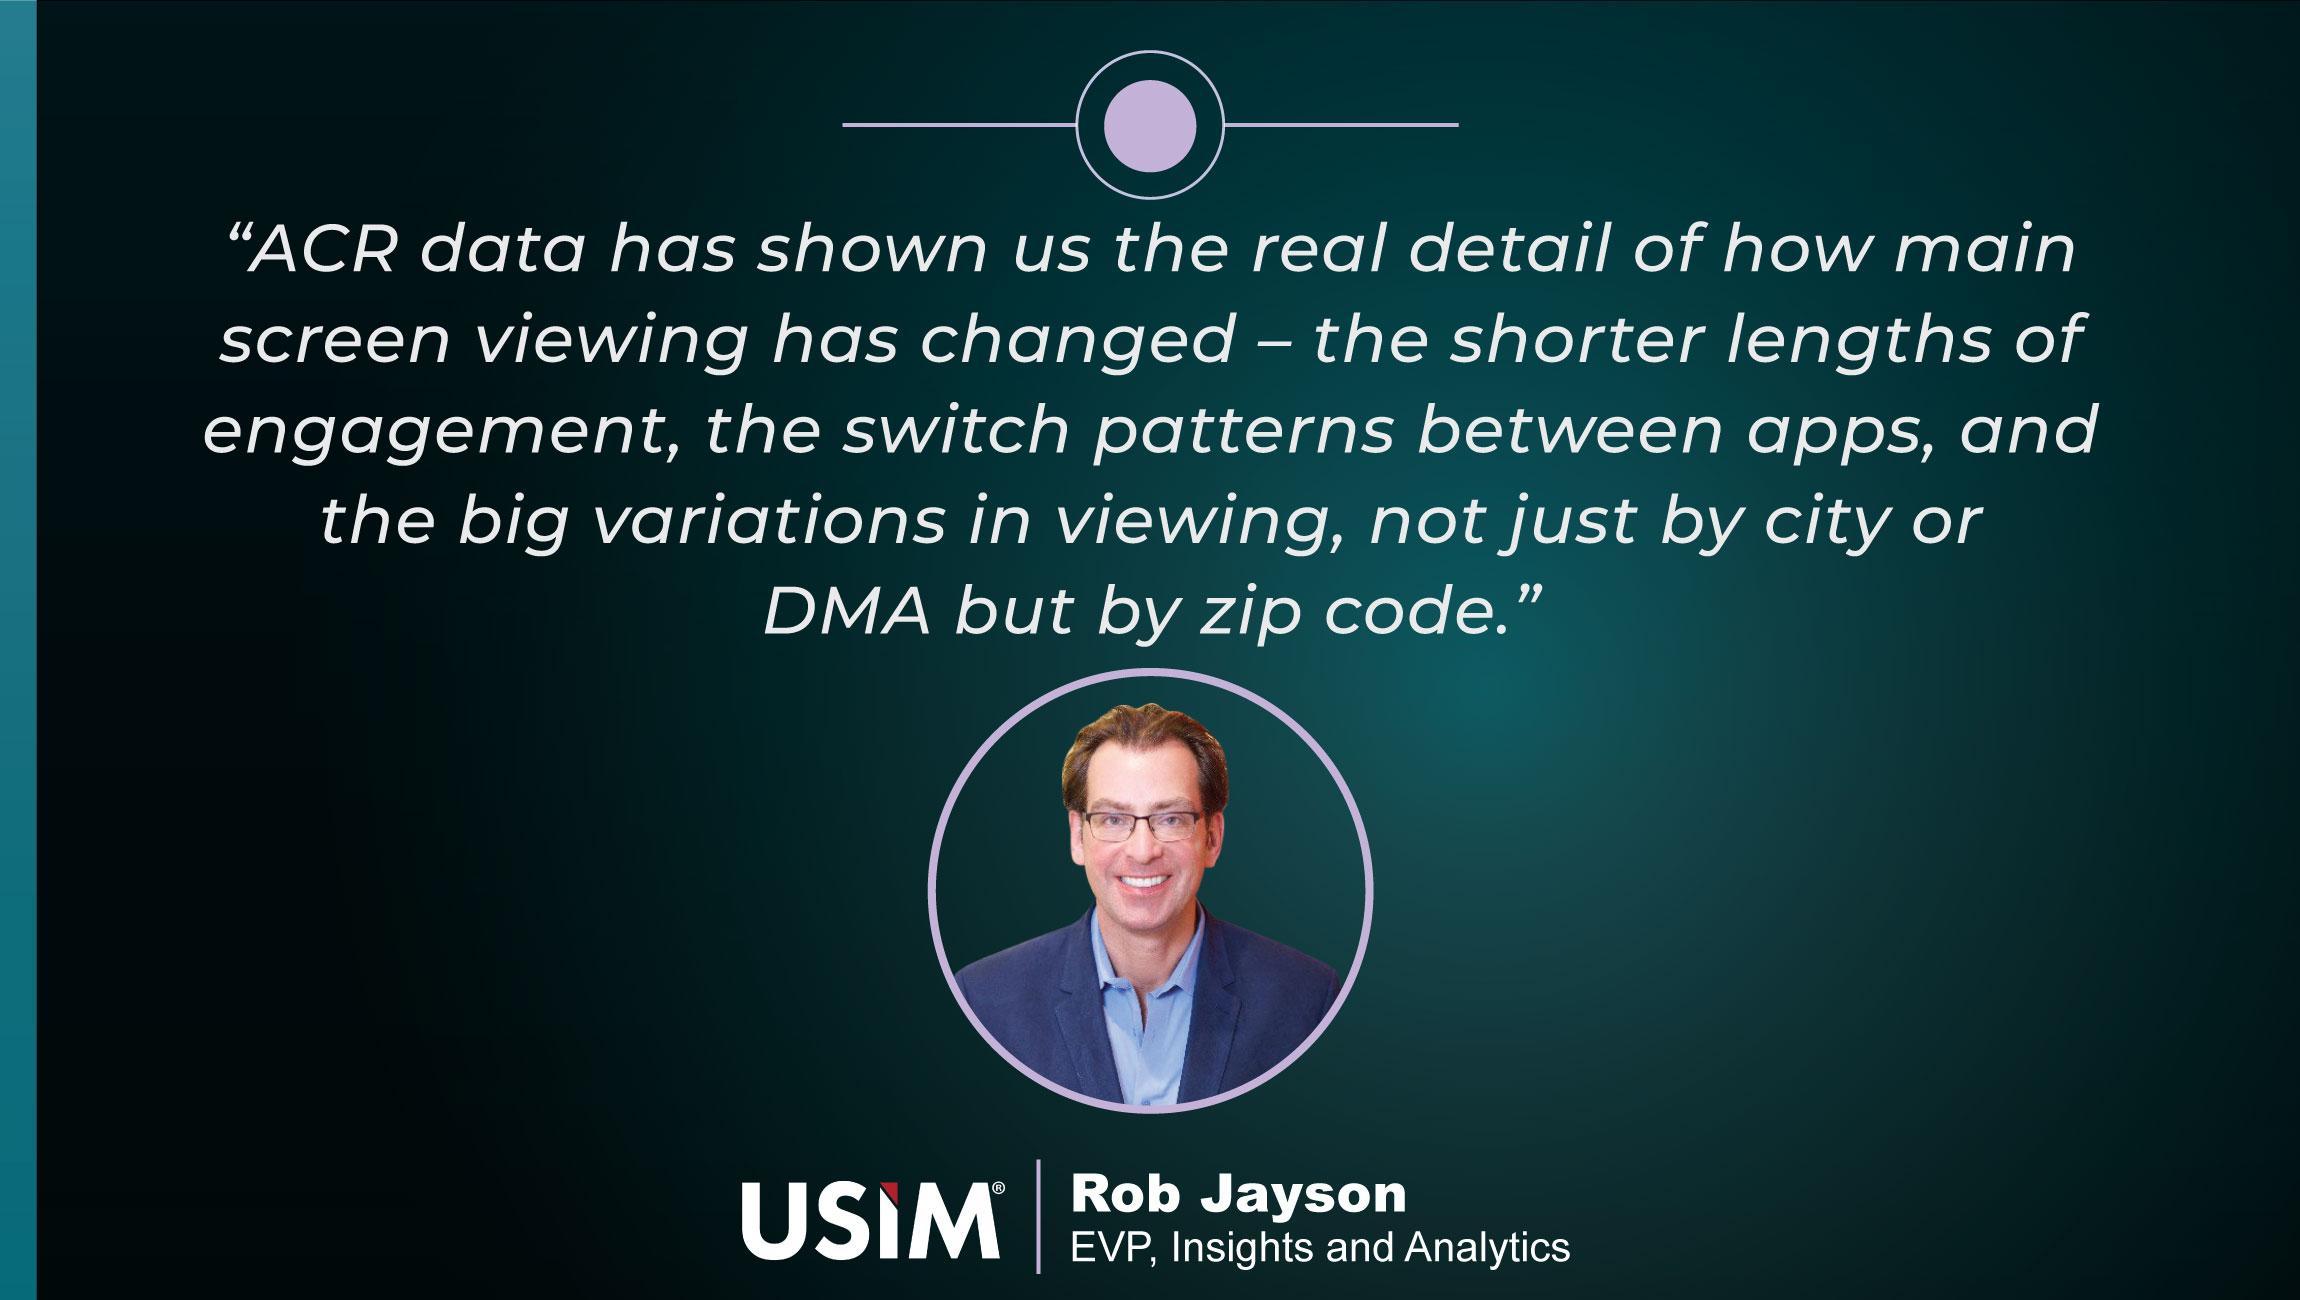 TechBytes with Rob Jayson, EVP, Insights & Analytics at USIM